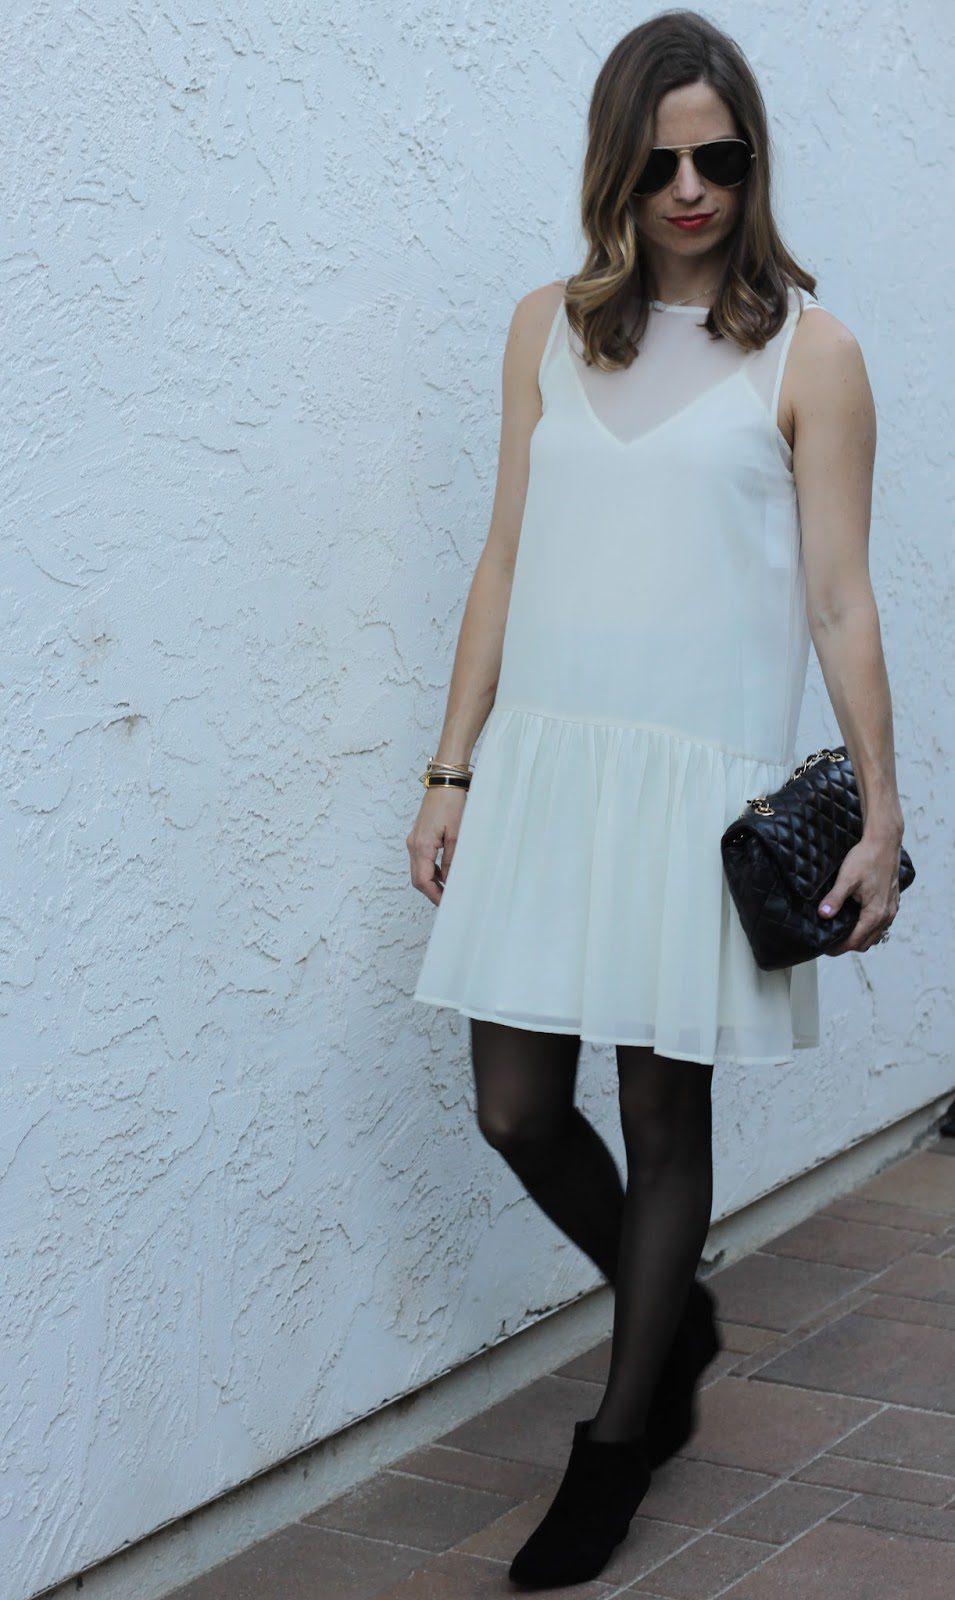 white dress in winter